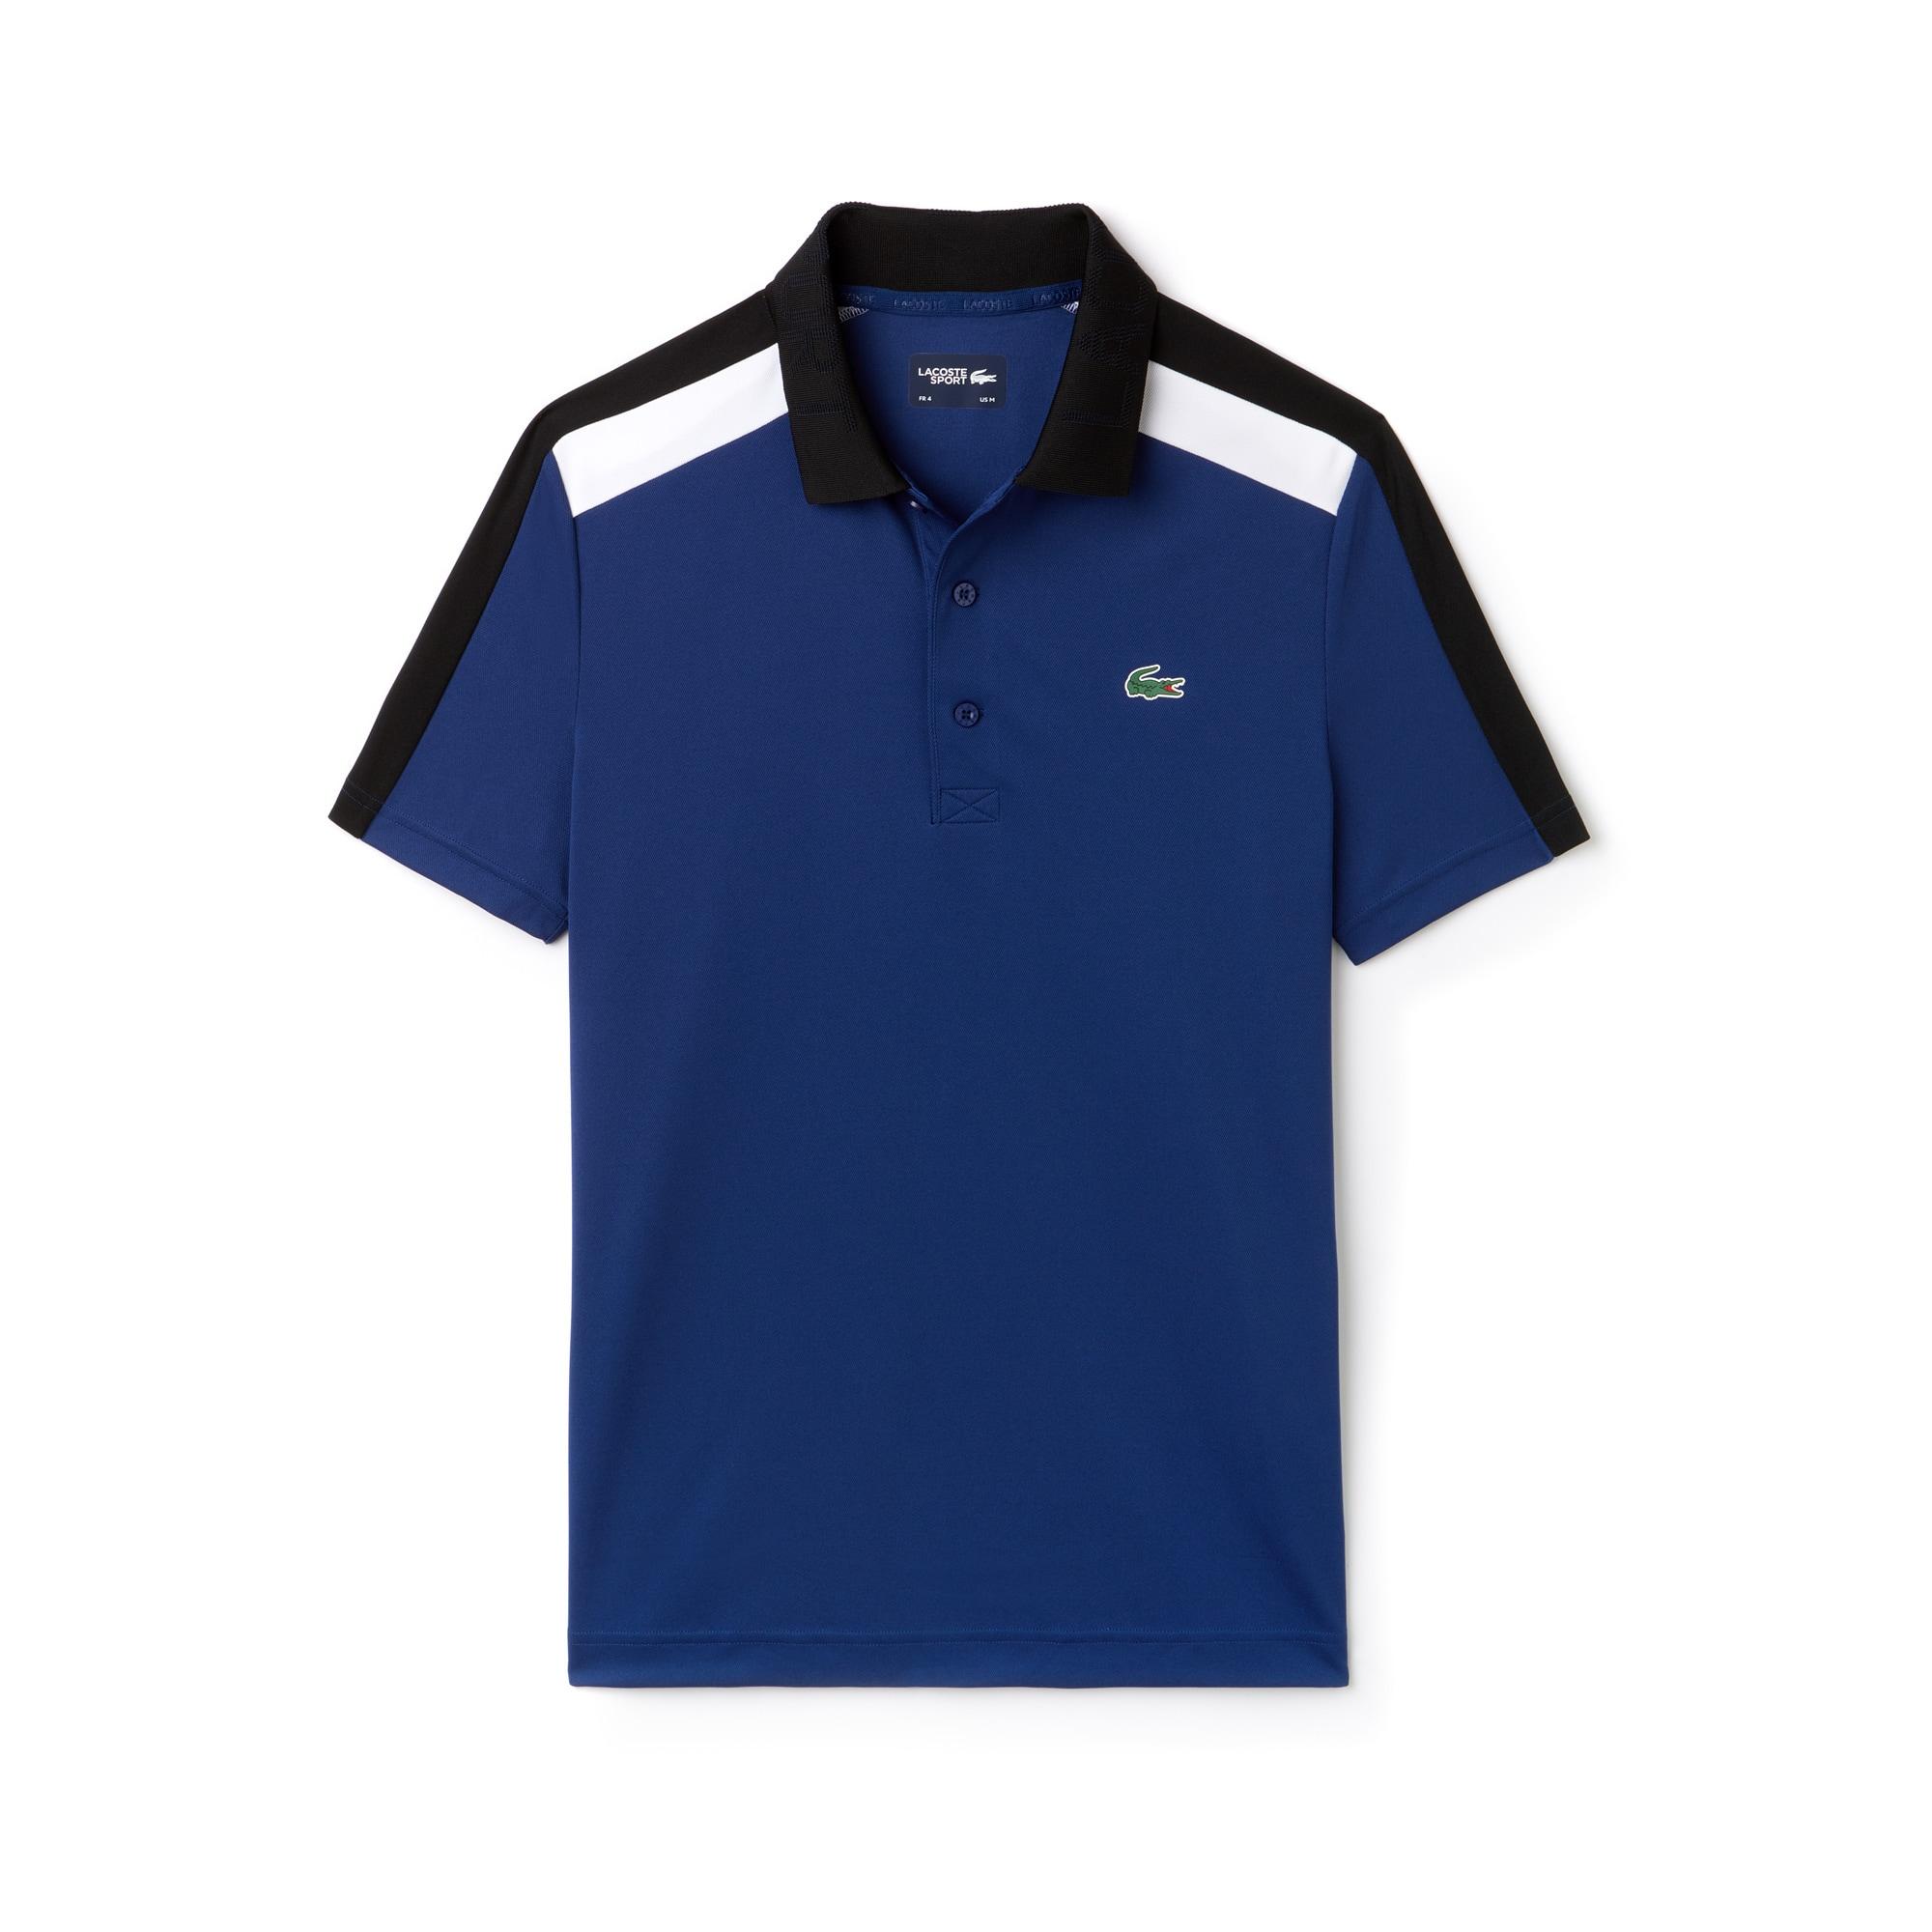 Men's Lacoste SPORT Contrast Band Technical Piqué Tennis Polo Shirt